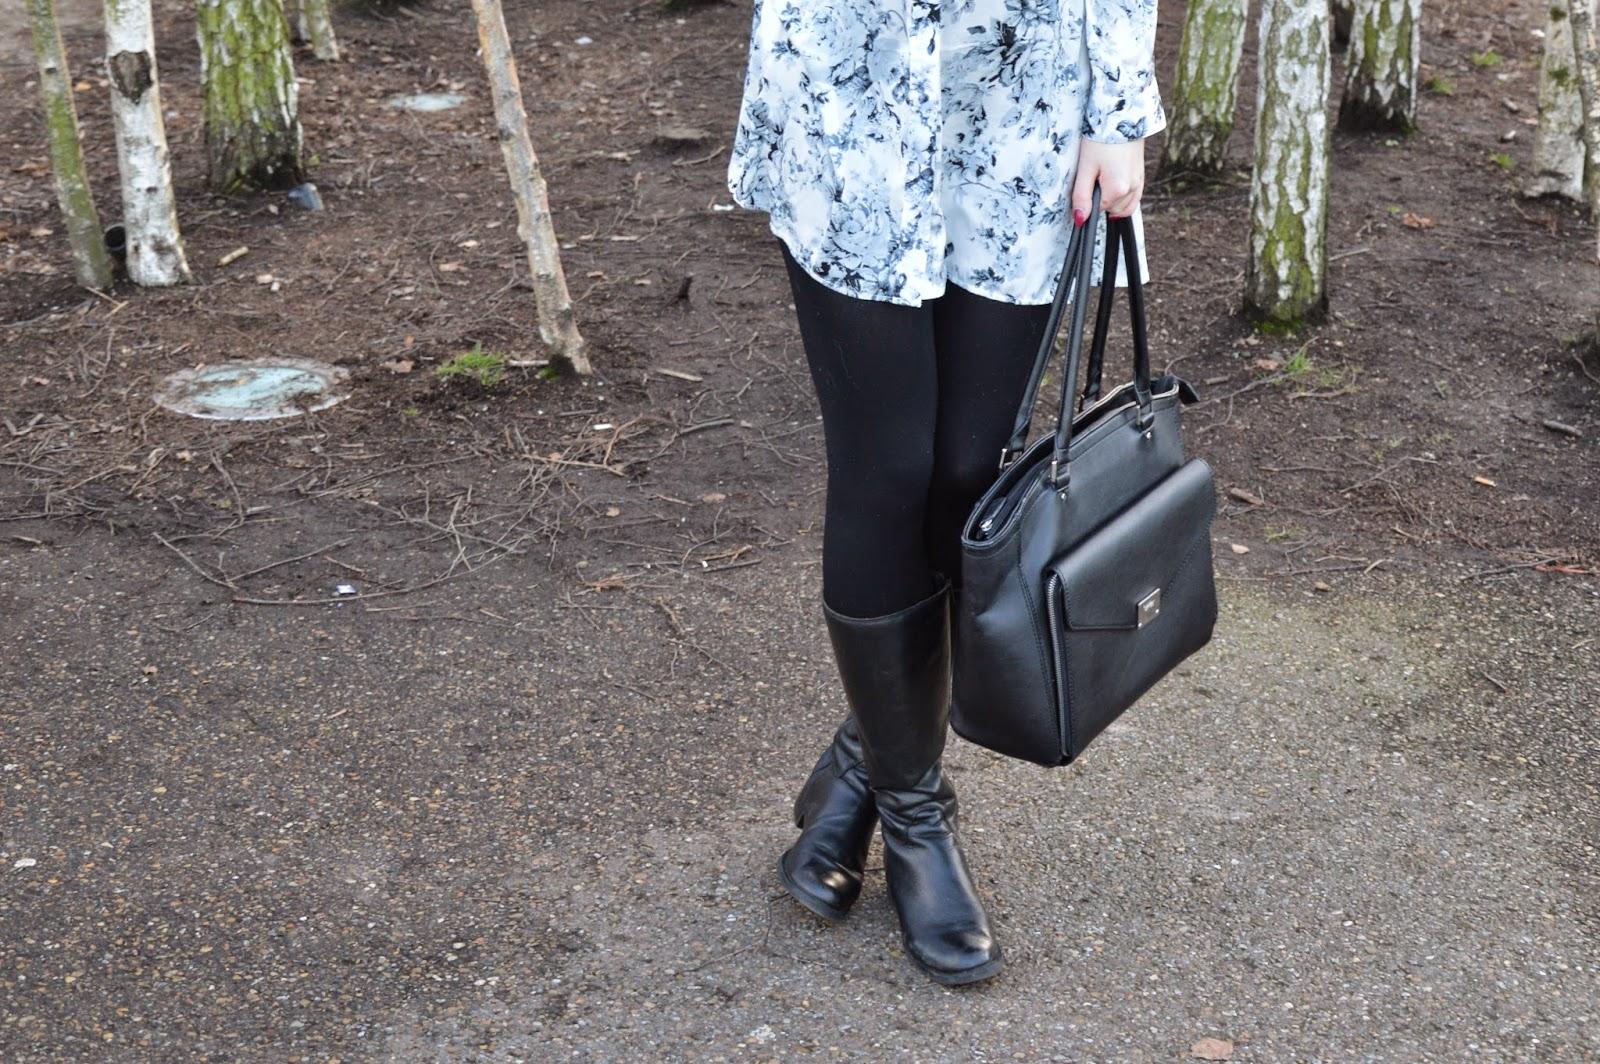 dress, london, shirt, southbank, boots, bag